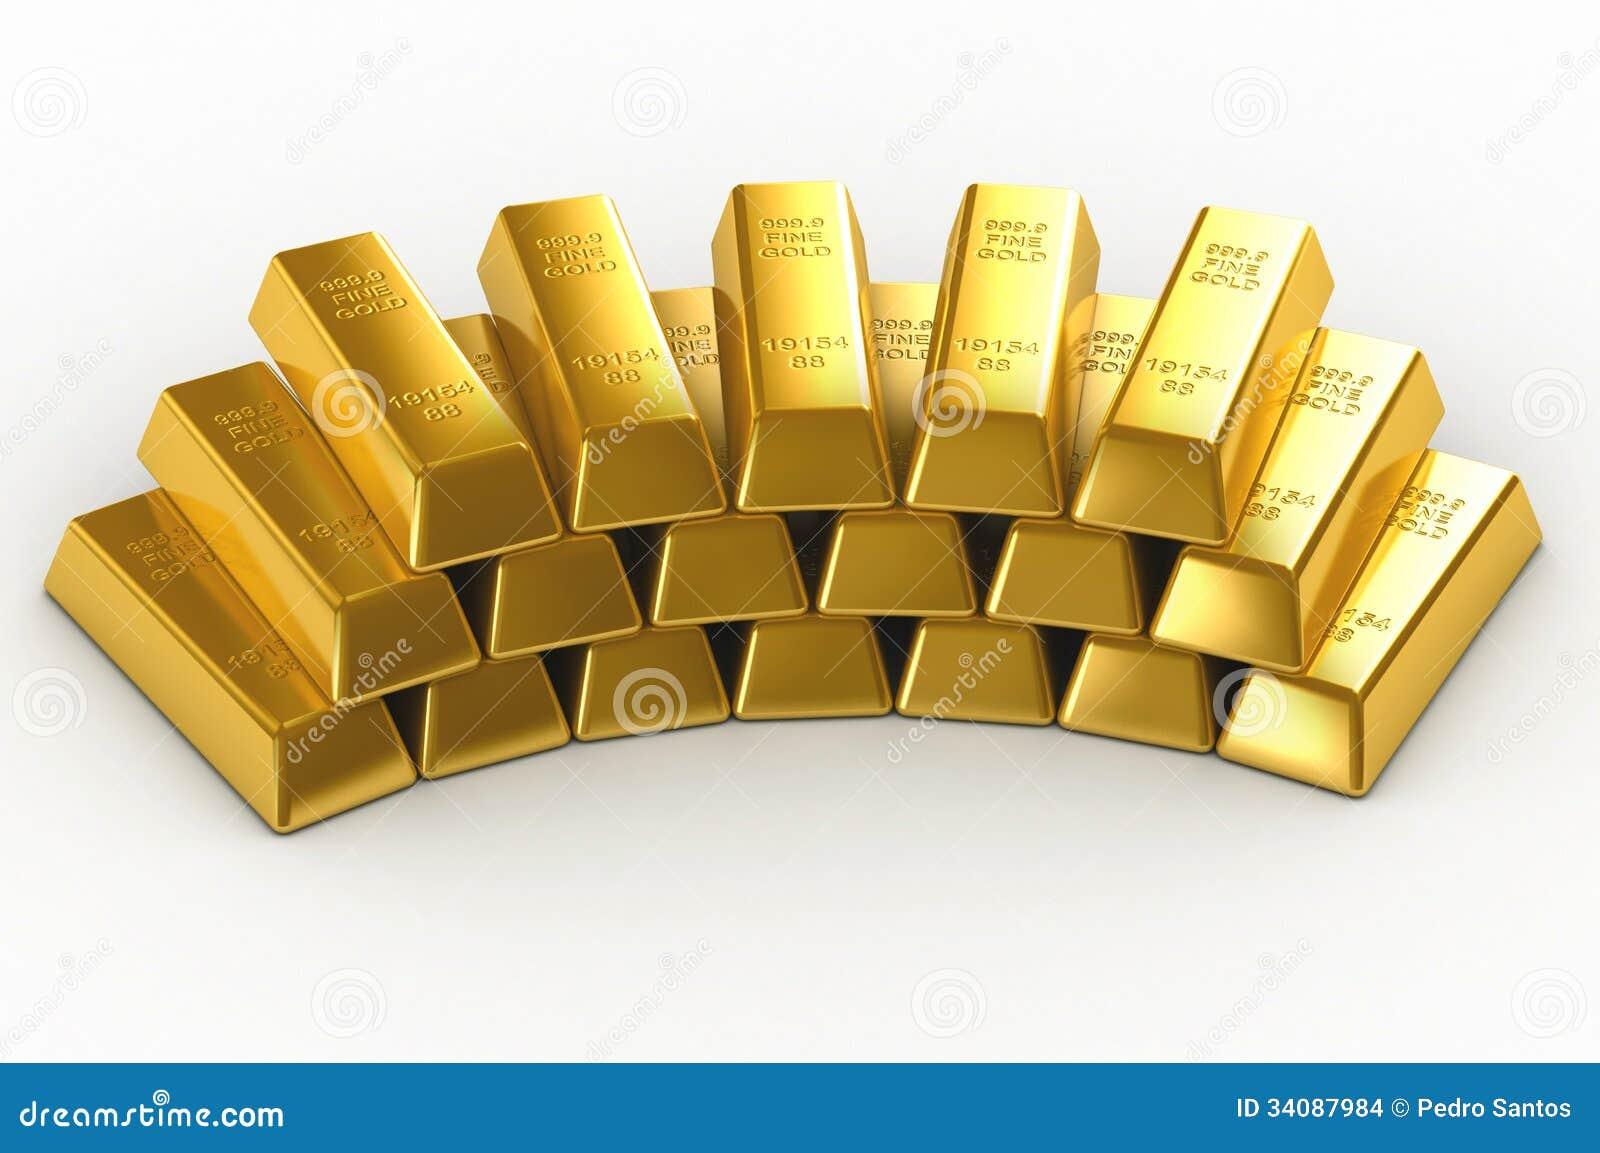 Stacks Of Gold Bars Stock Photo. Image Of Metal, Block